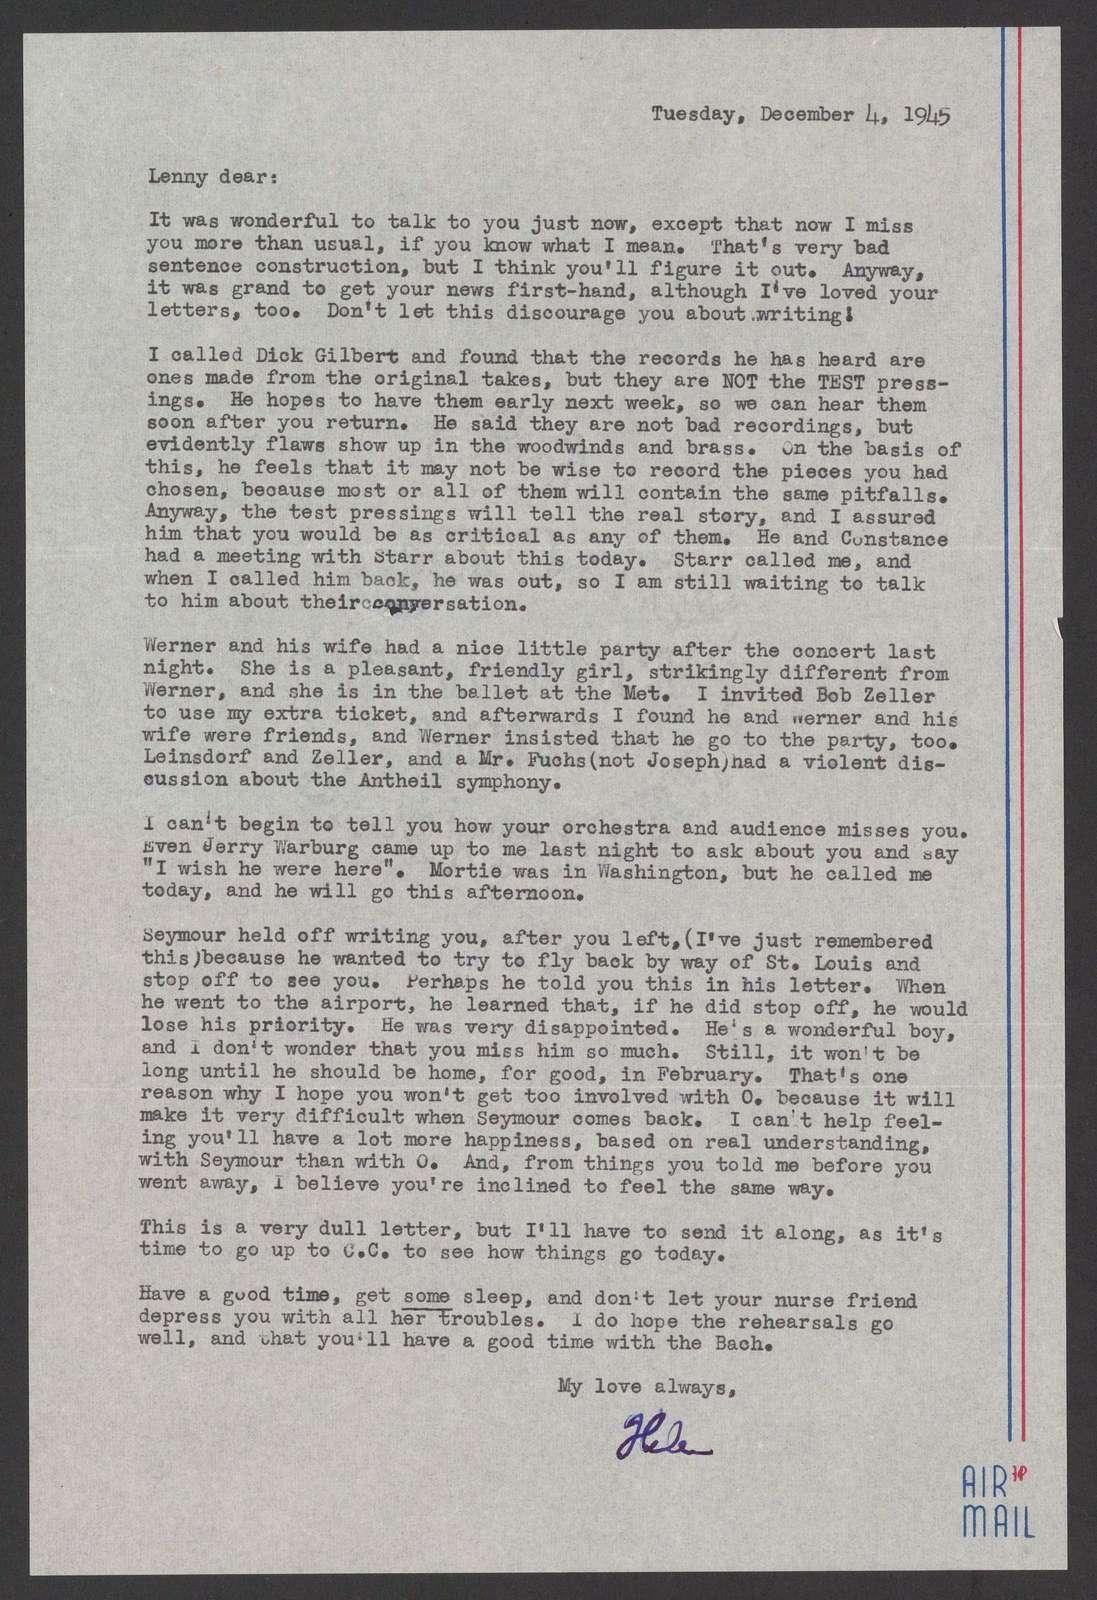 Helen Coates to Leonard Bernstein, December 4, 1945